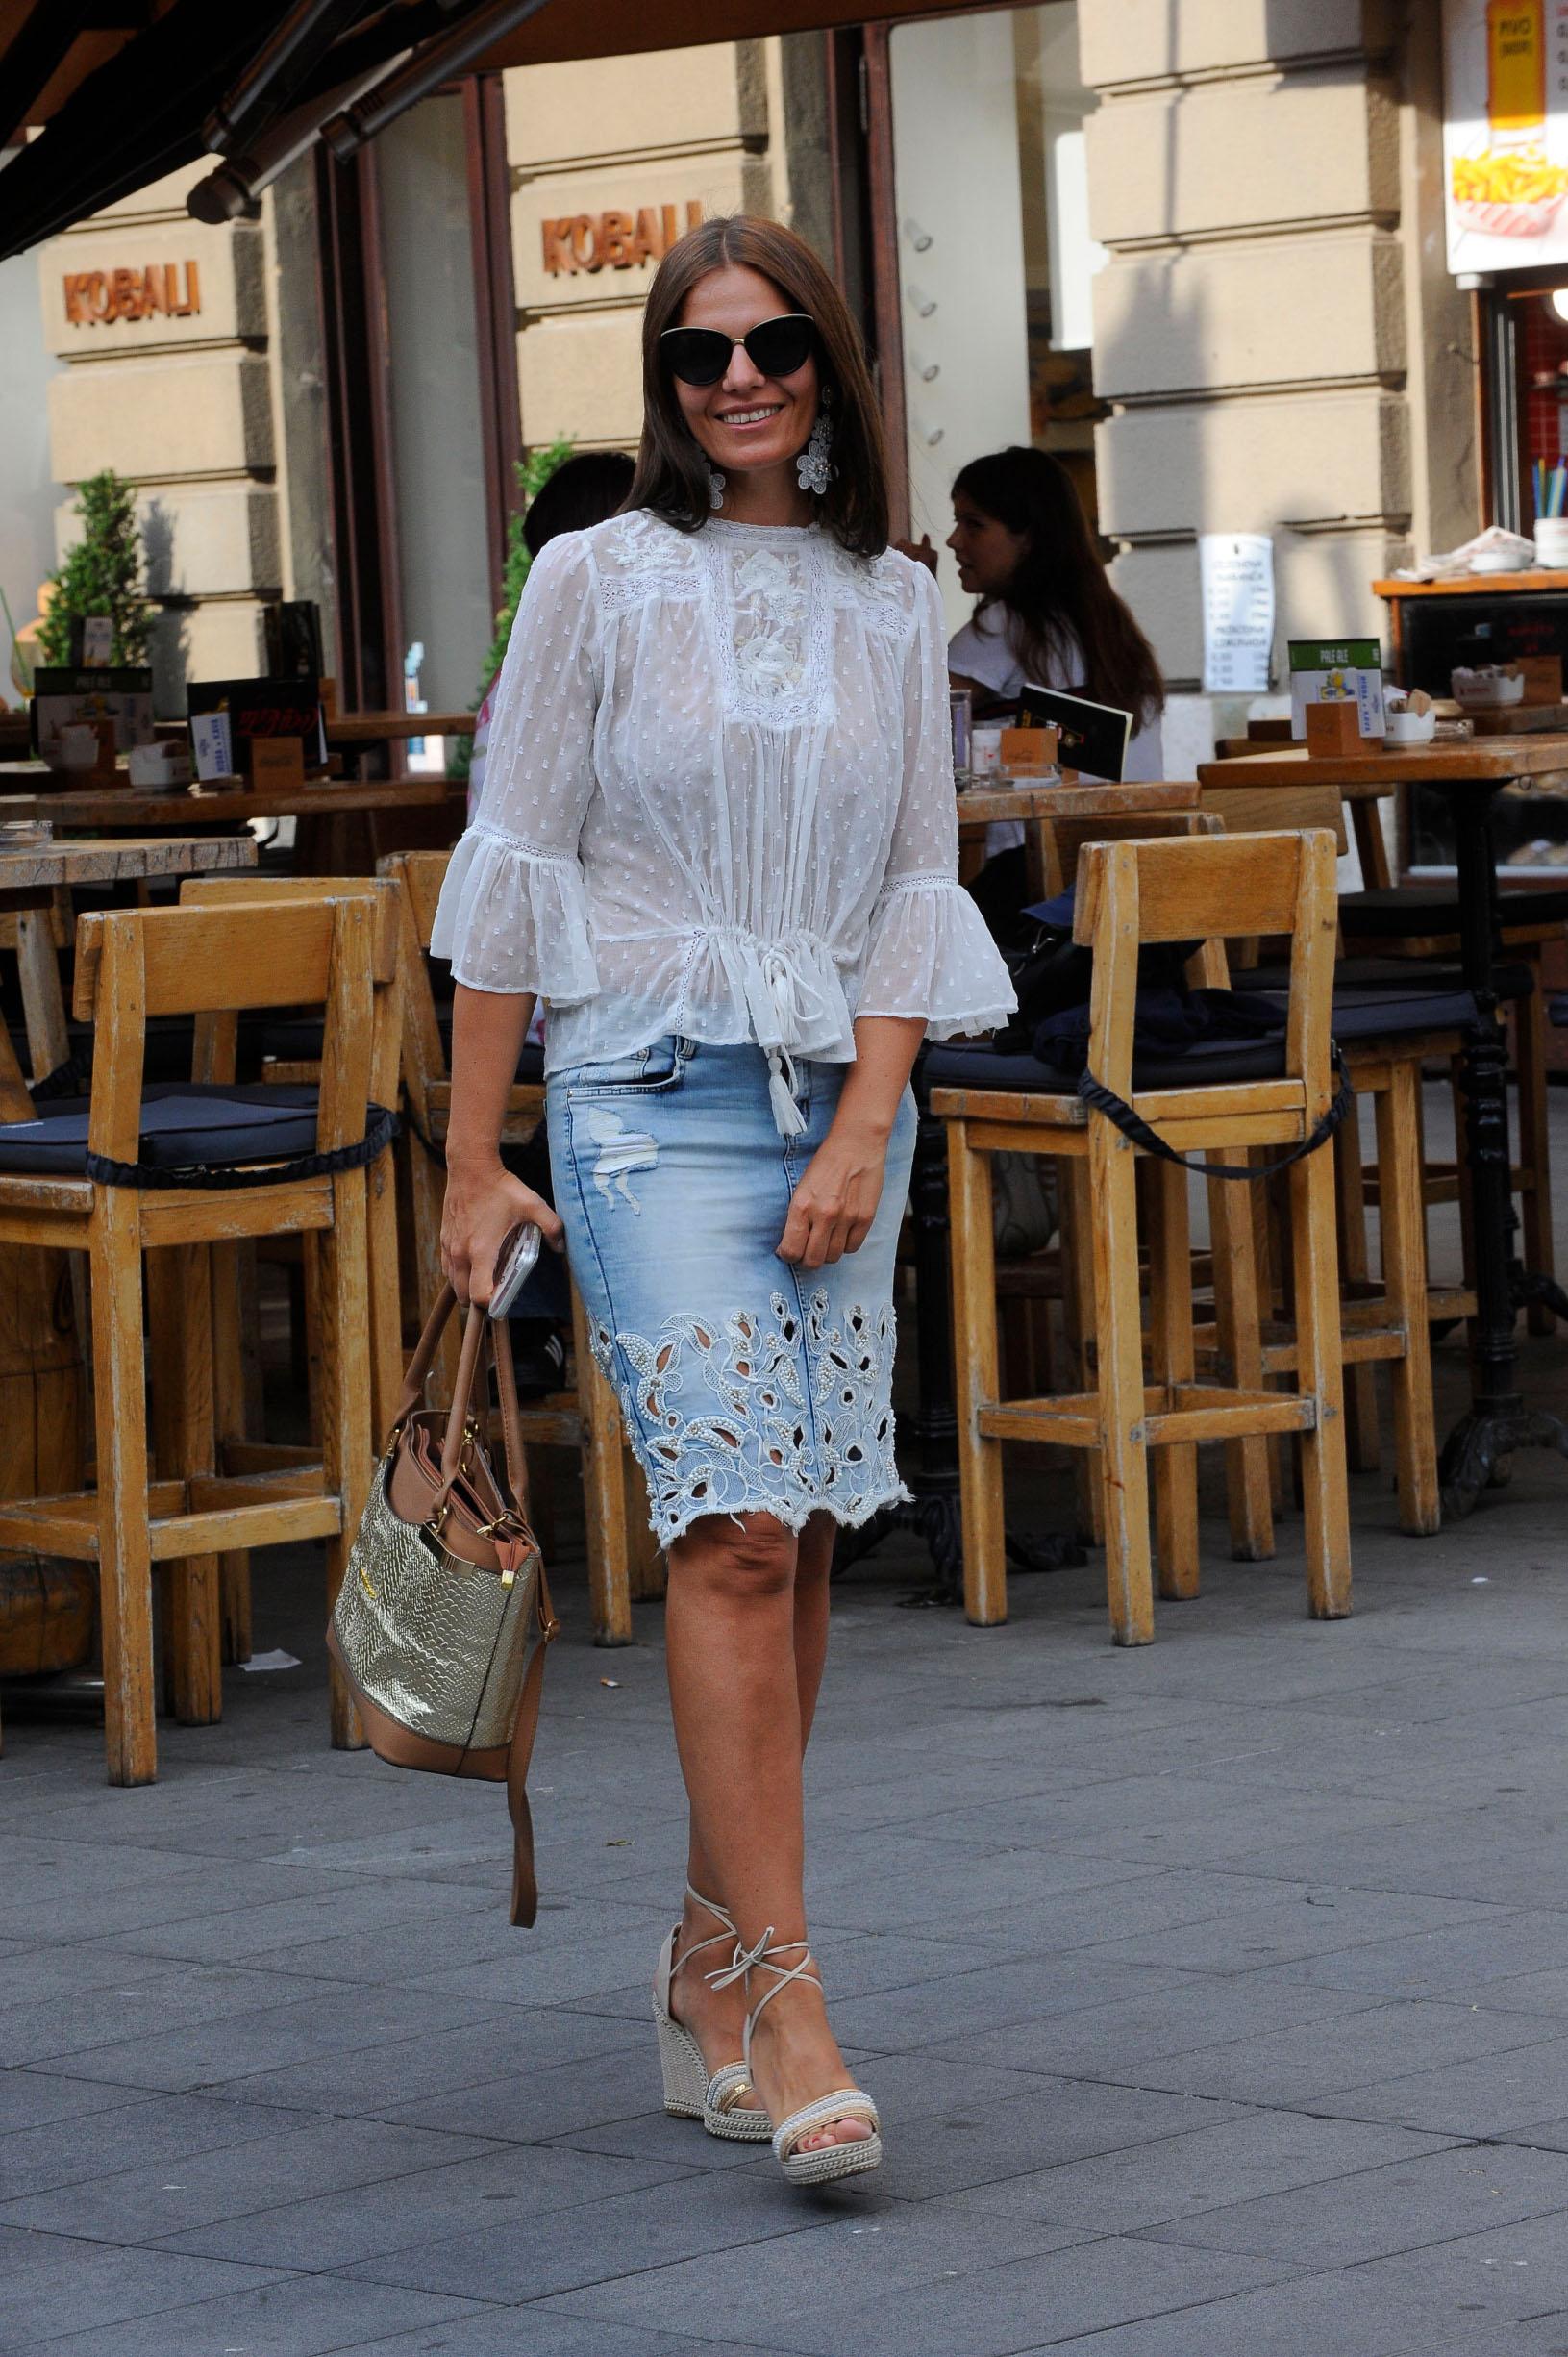 Ivančica Pahor